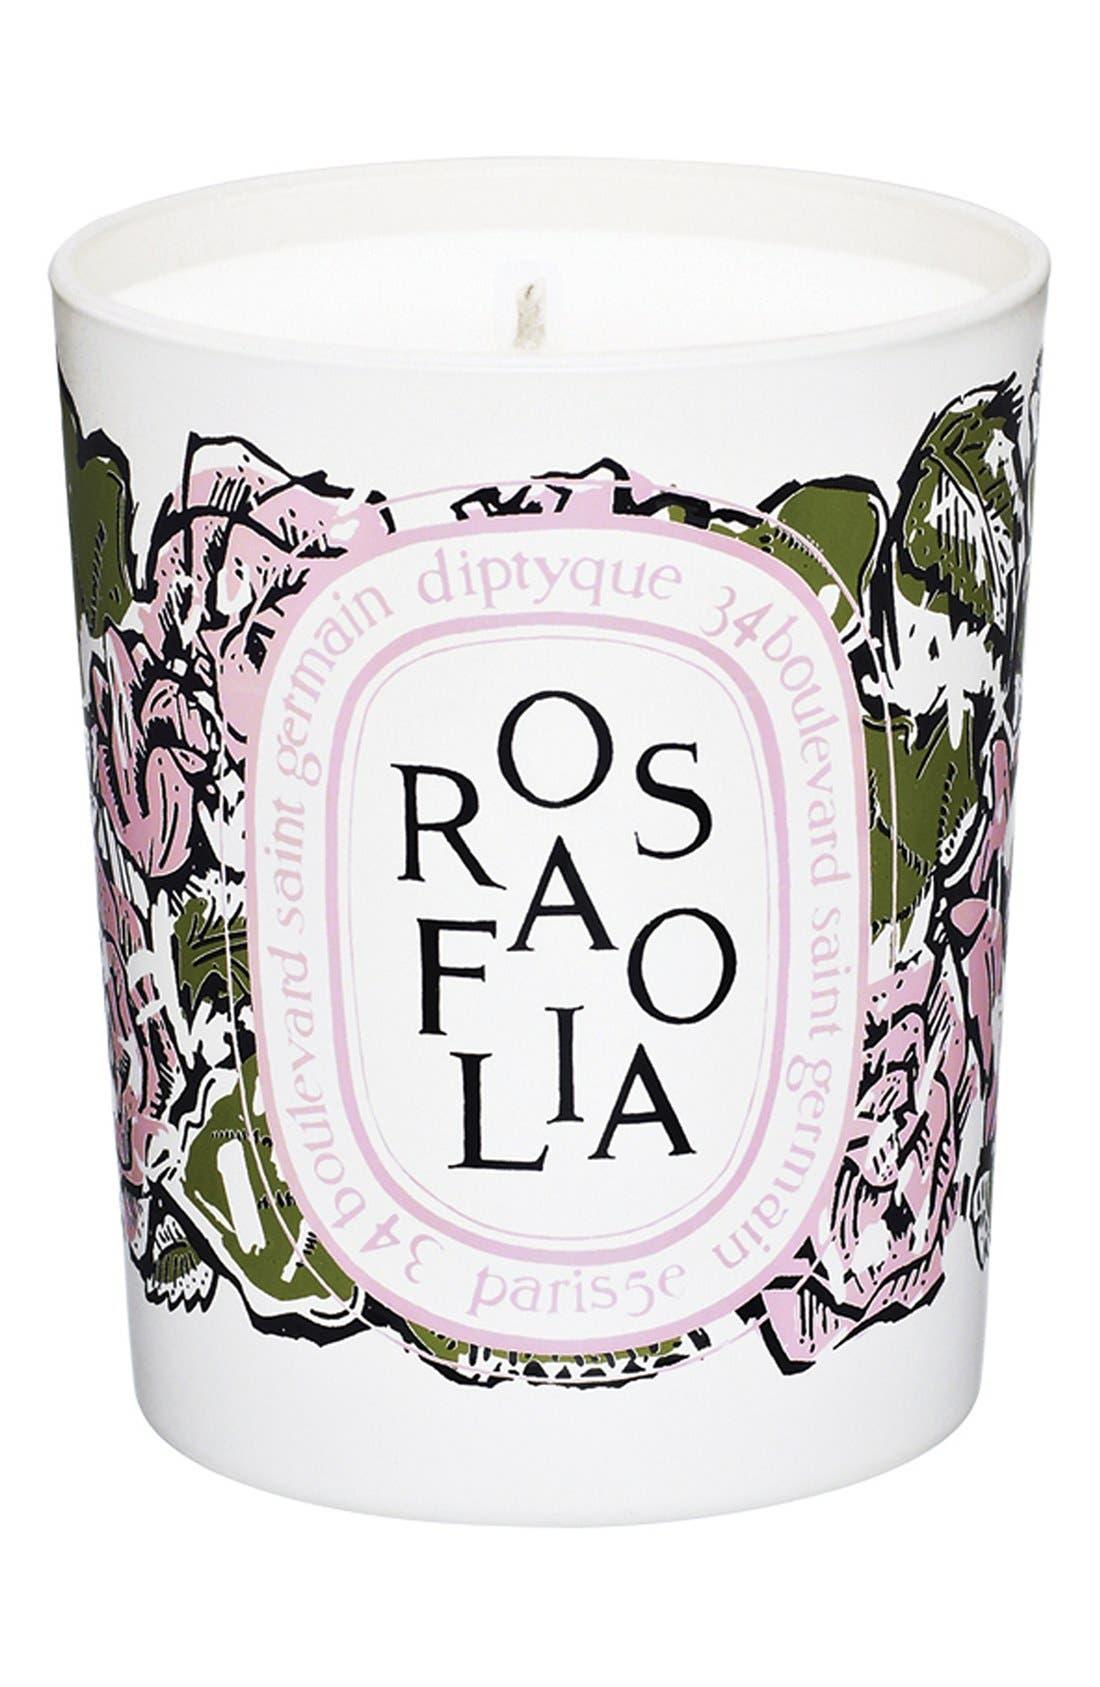 'Rosafolia' Candle,                             Main thumbnail 1, color,                             000